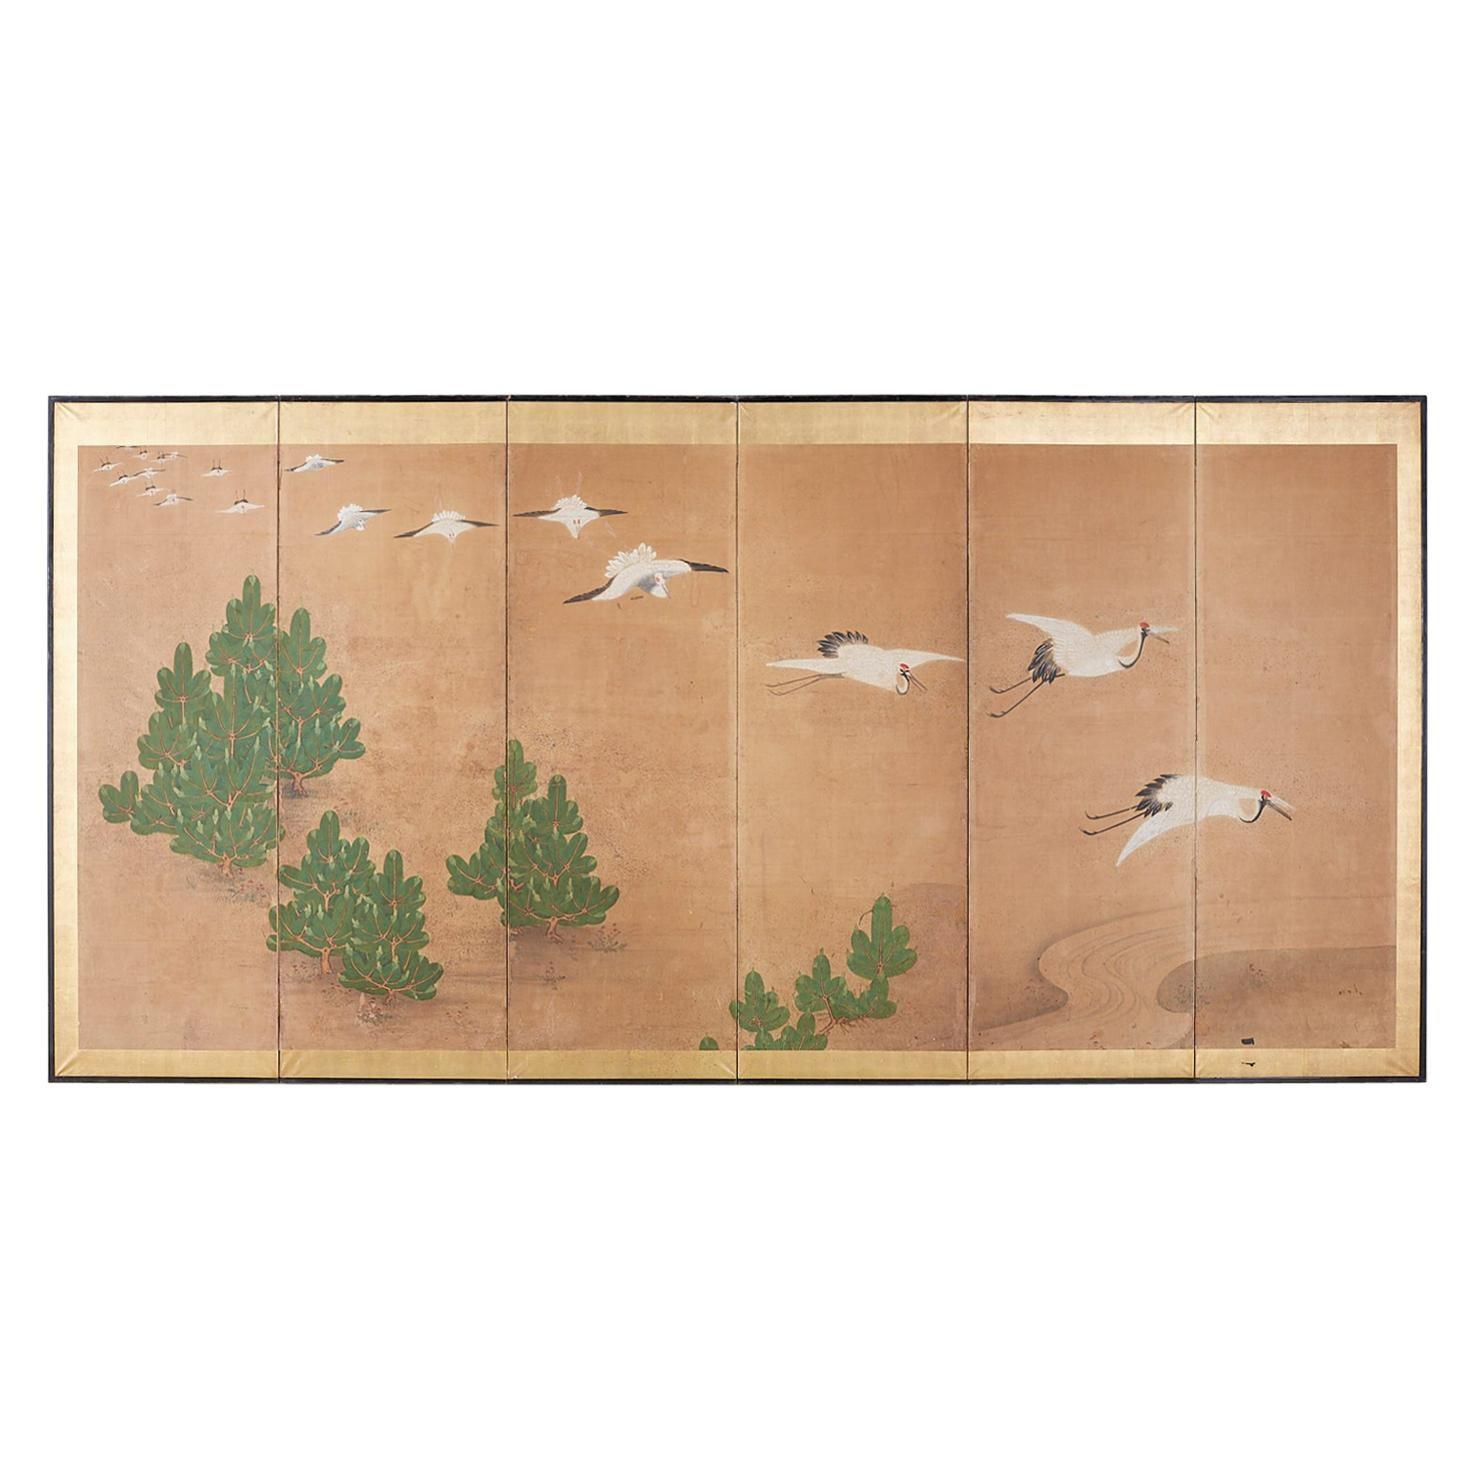 Japanese Six-Panel Screen of Cranes in Flight